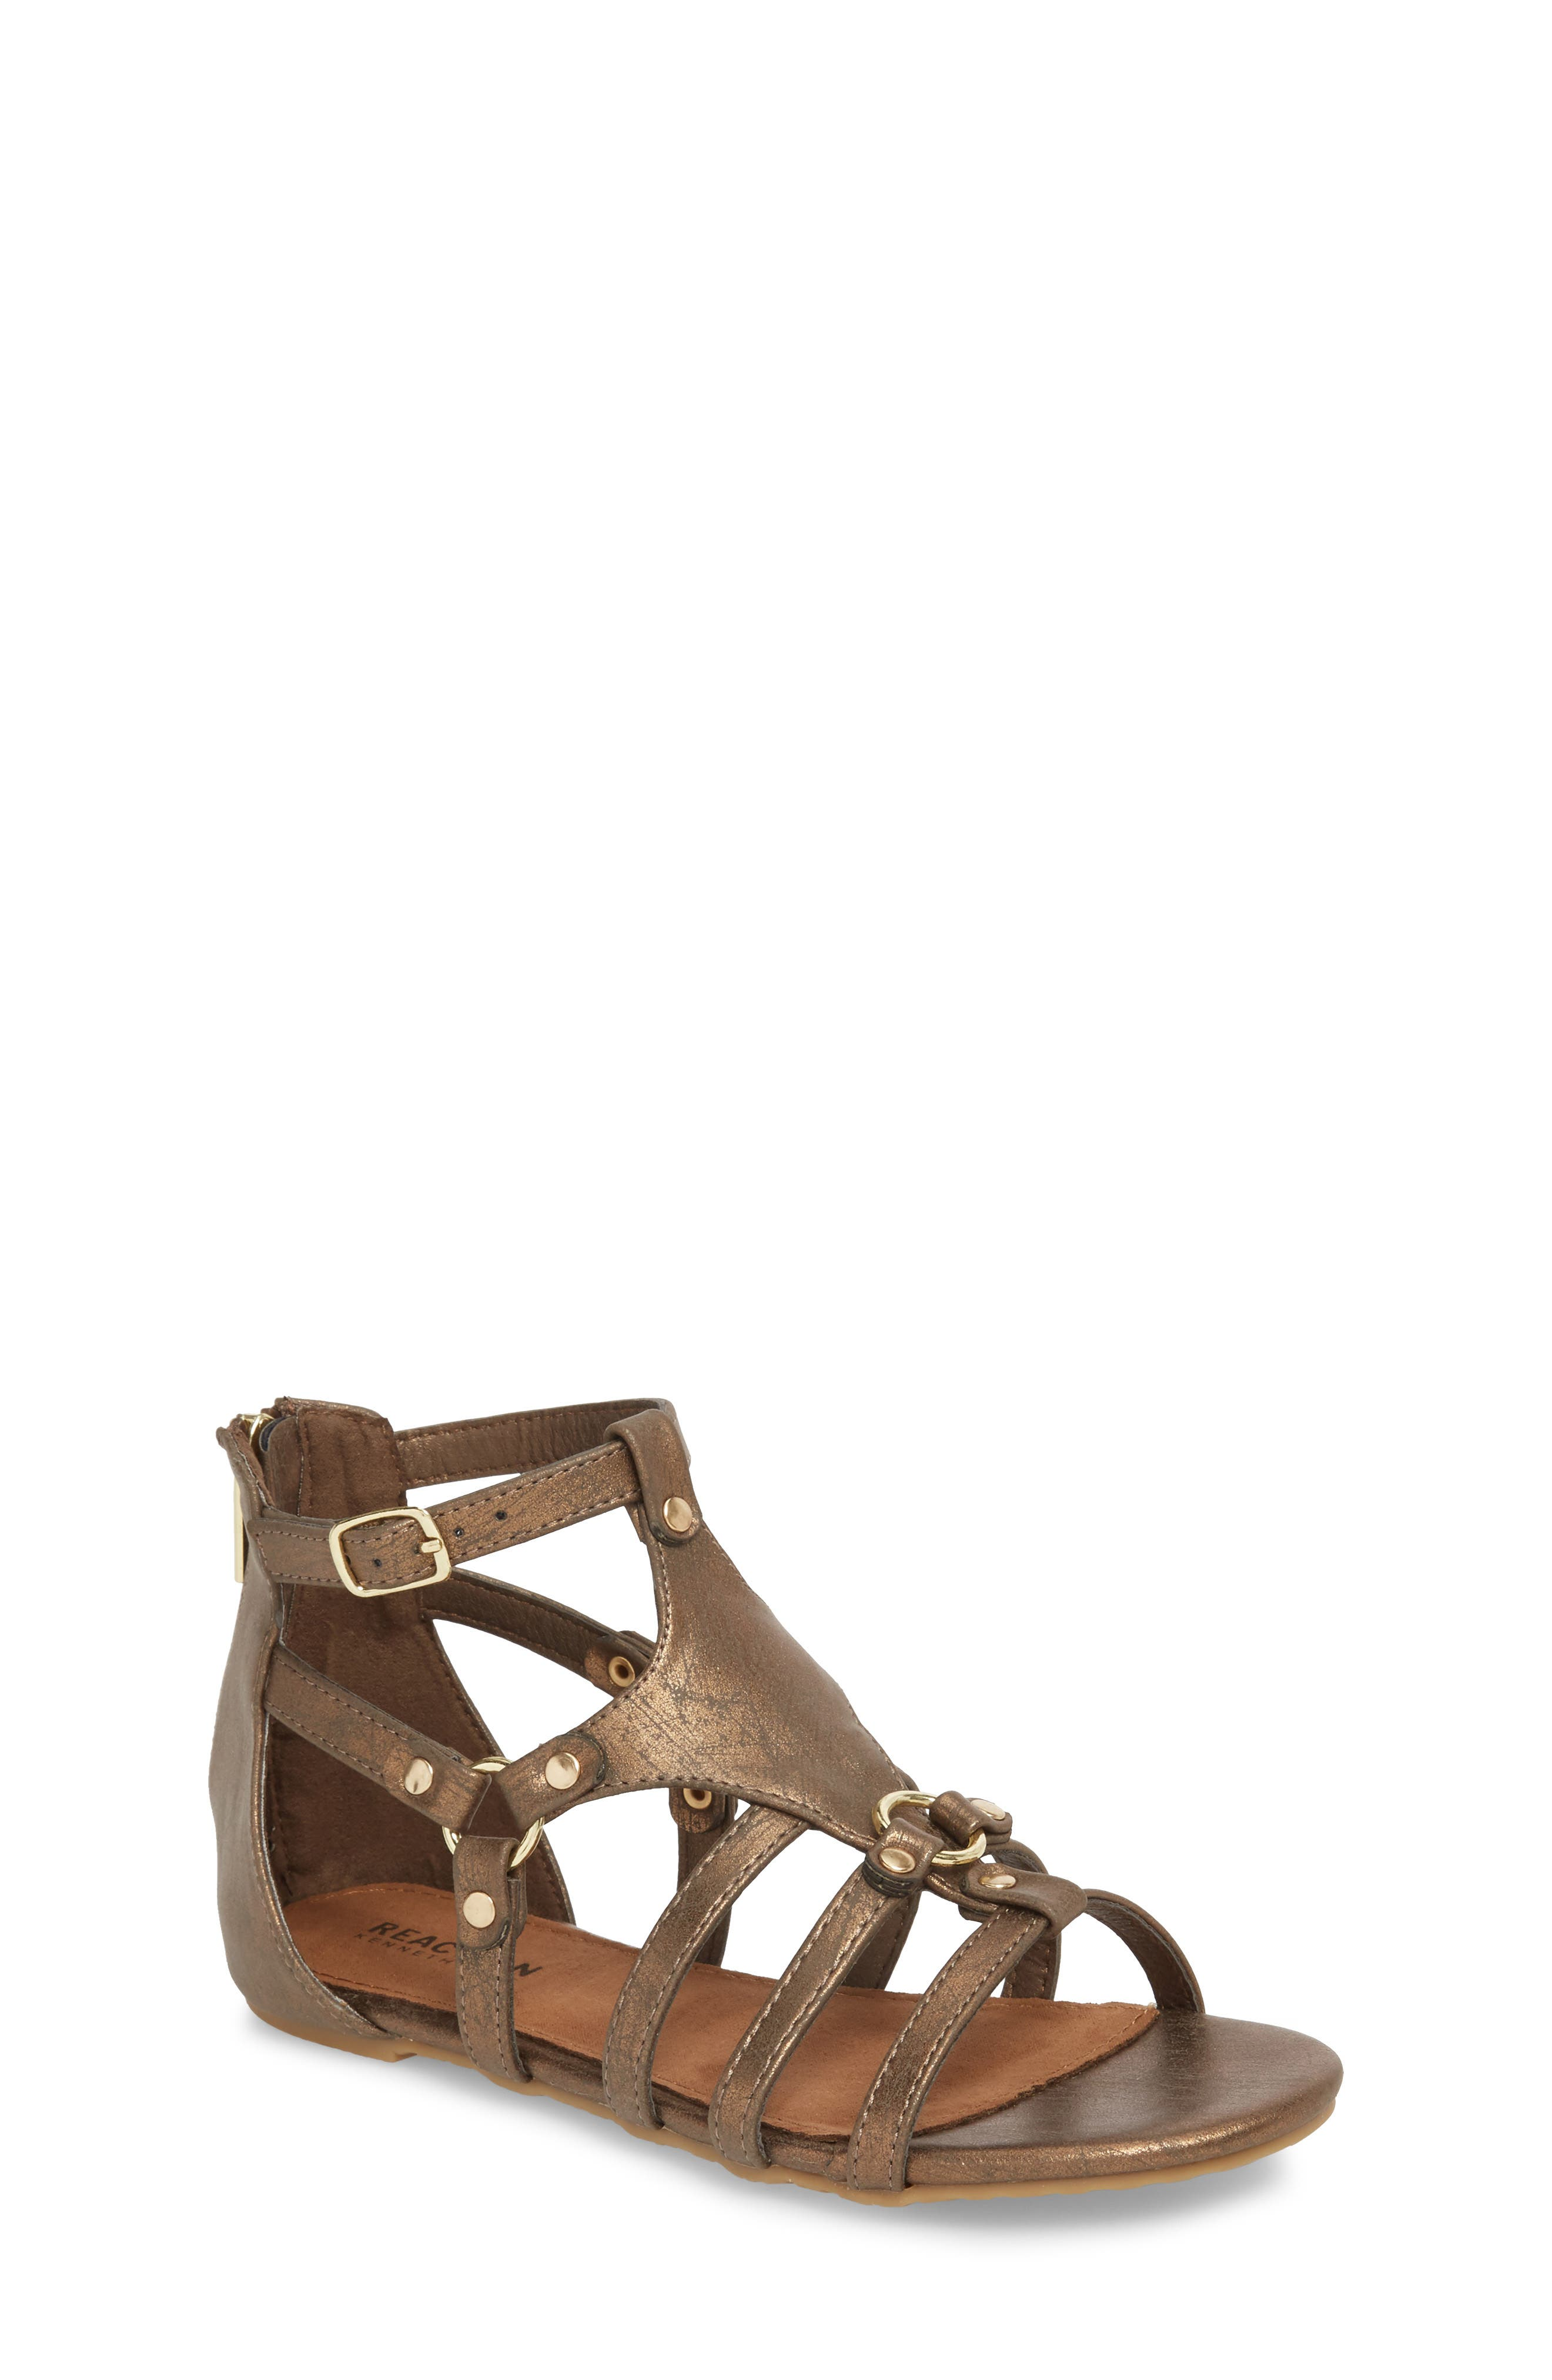 Reaction Kenneth Cole Kiera Metallic Sandal,                         Main,                         color, Bronze